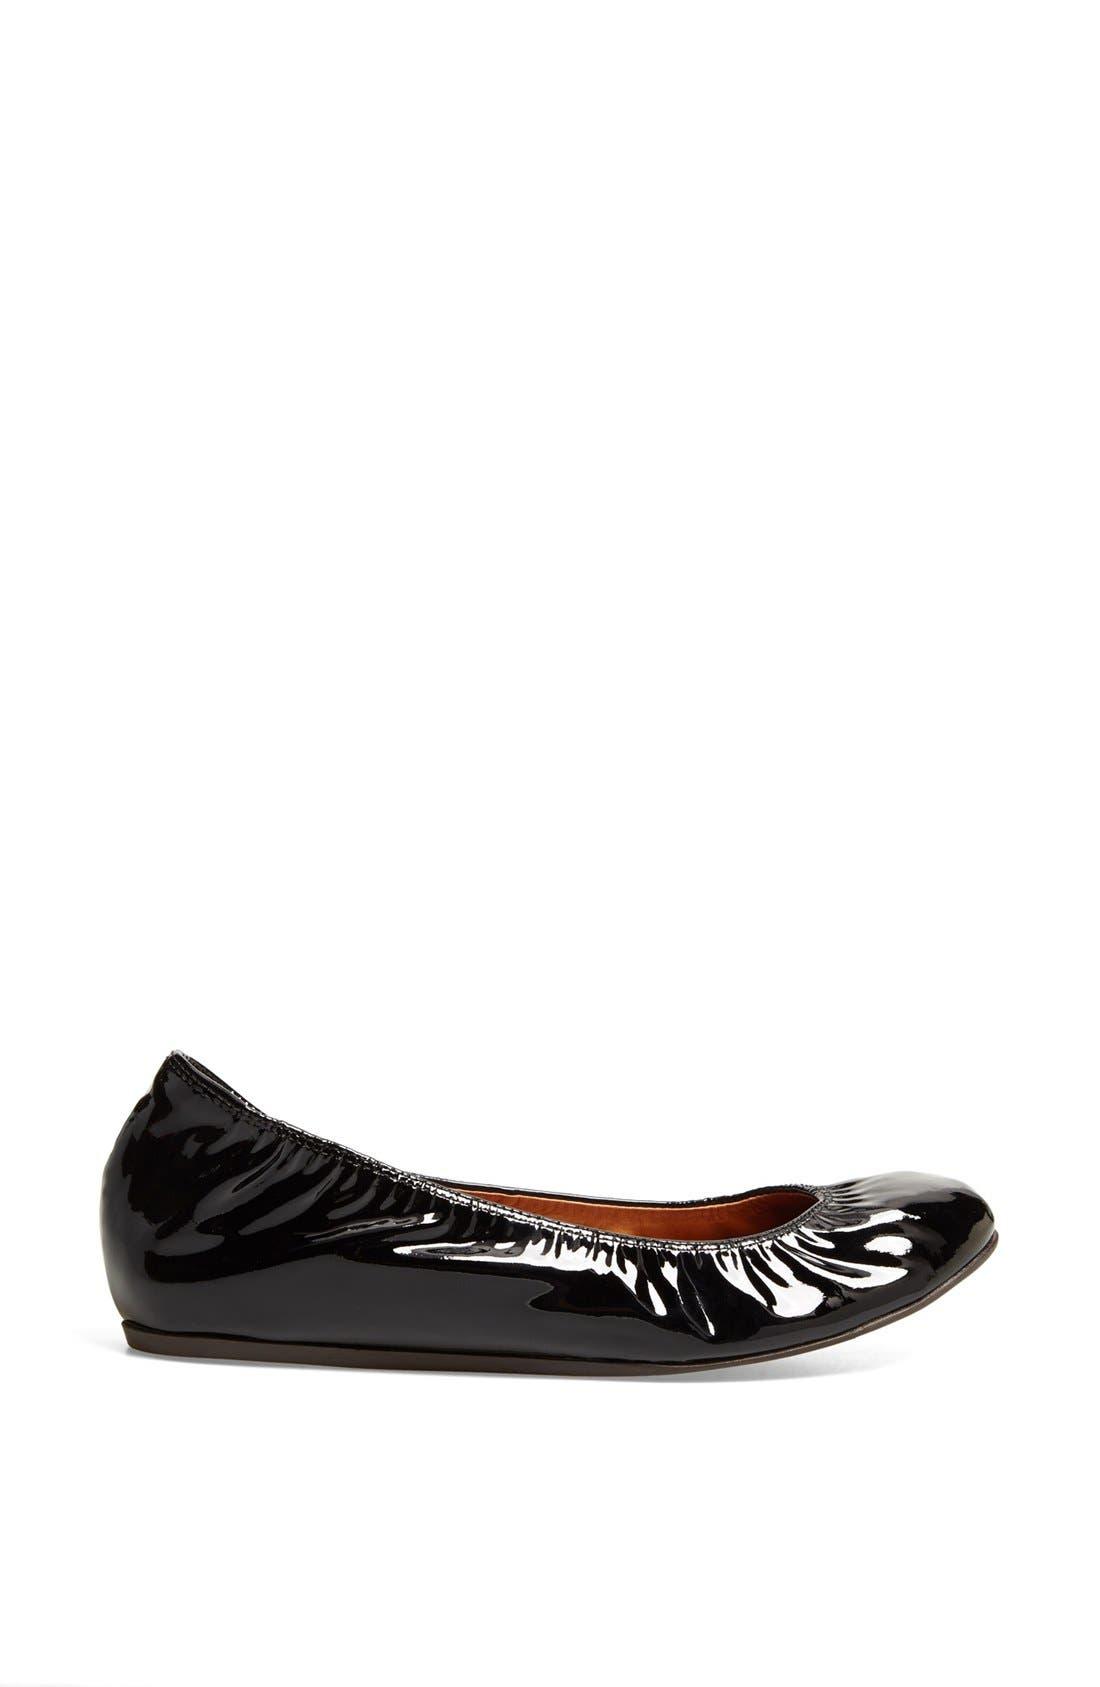 Alternate Image 4  - Lanvin Patent Leather Ballerina Flat